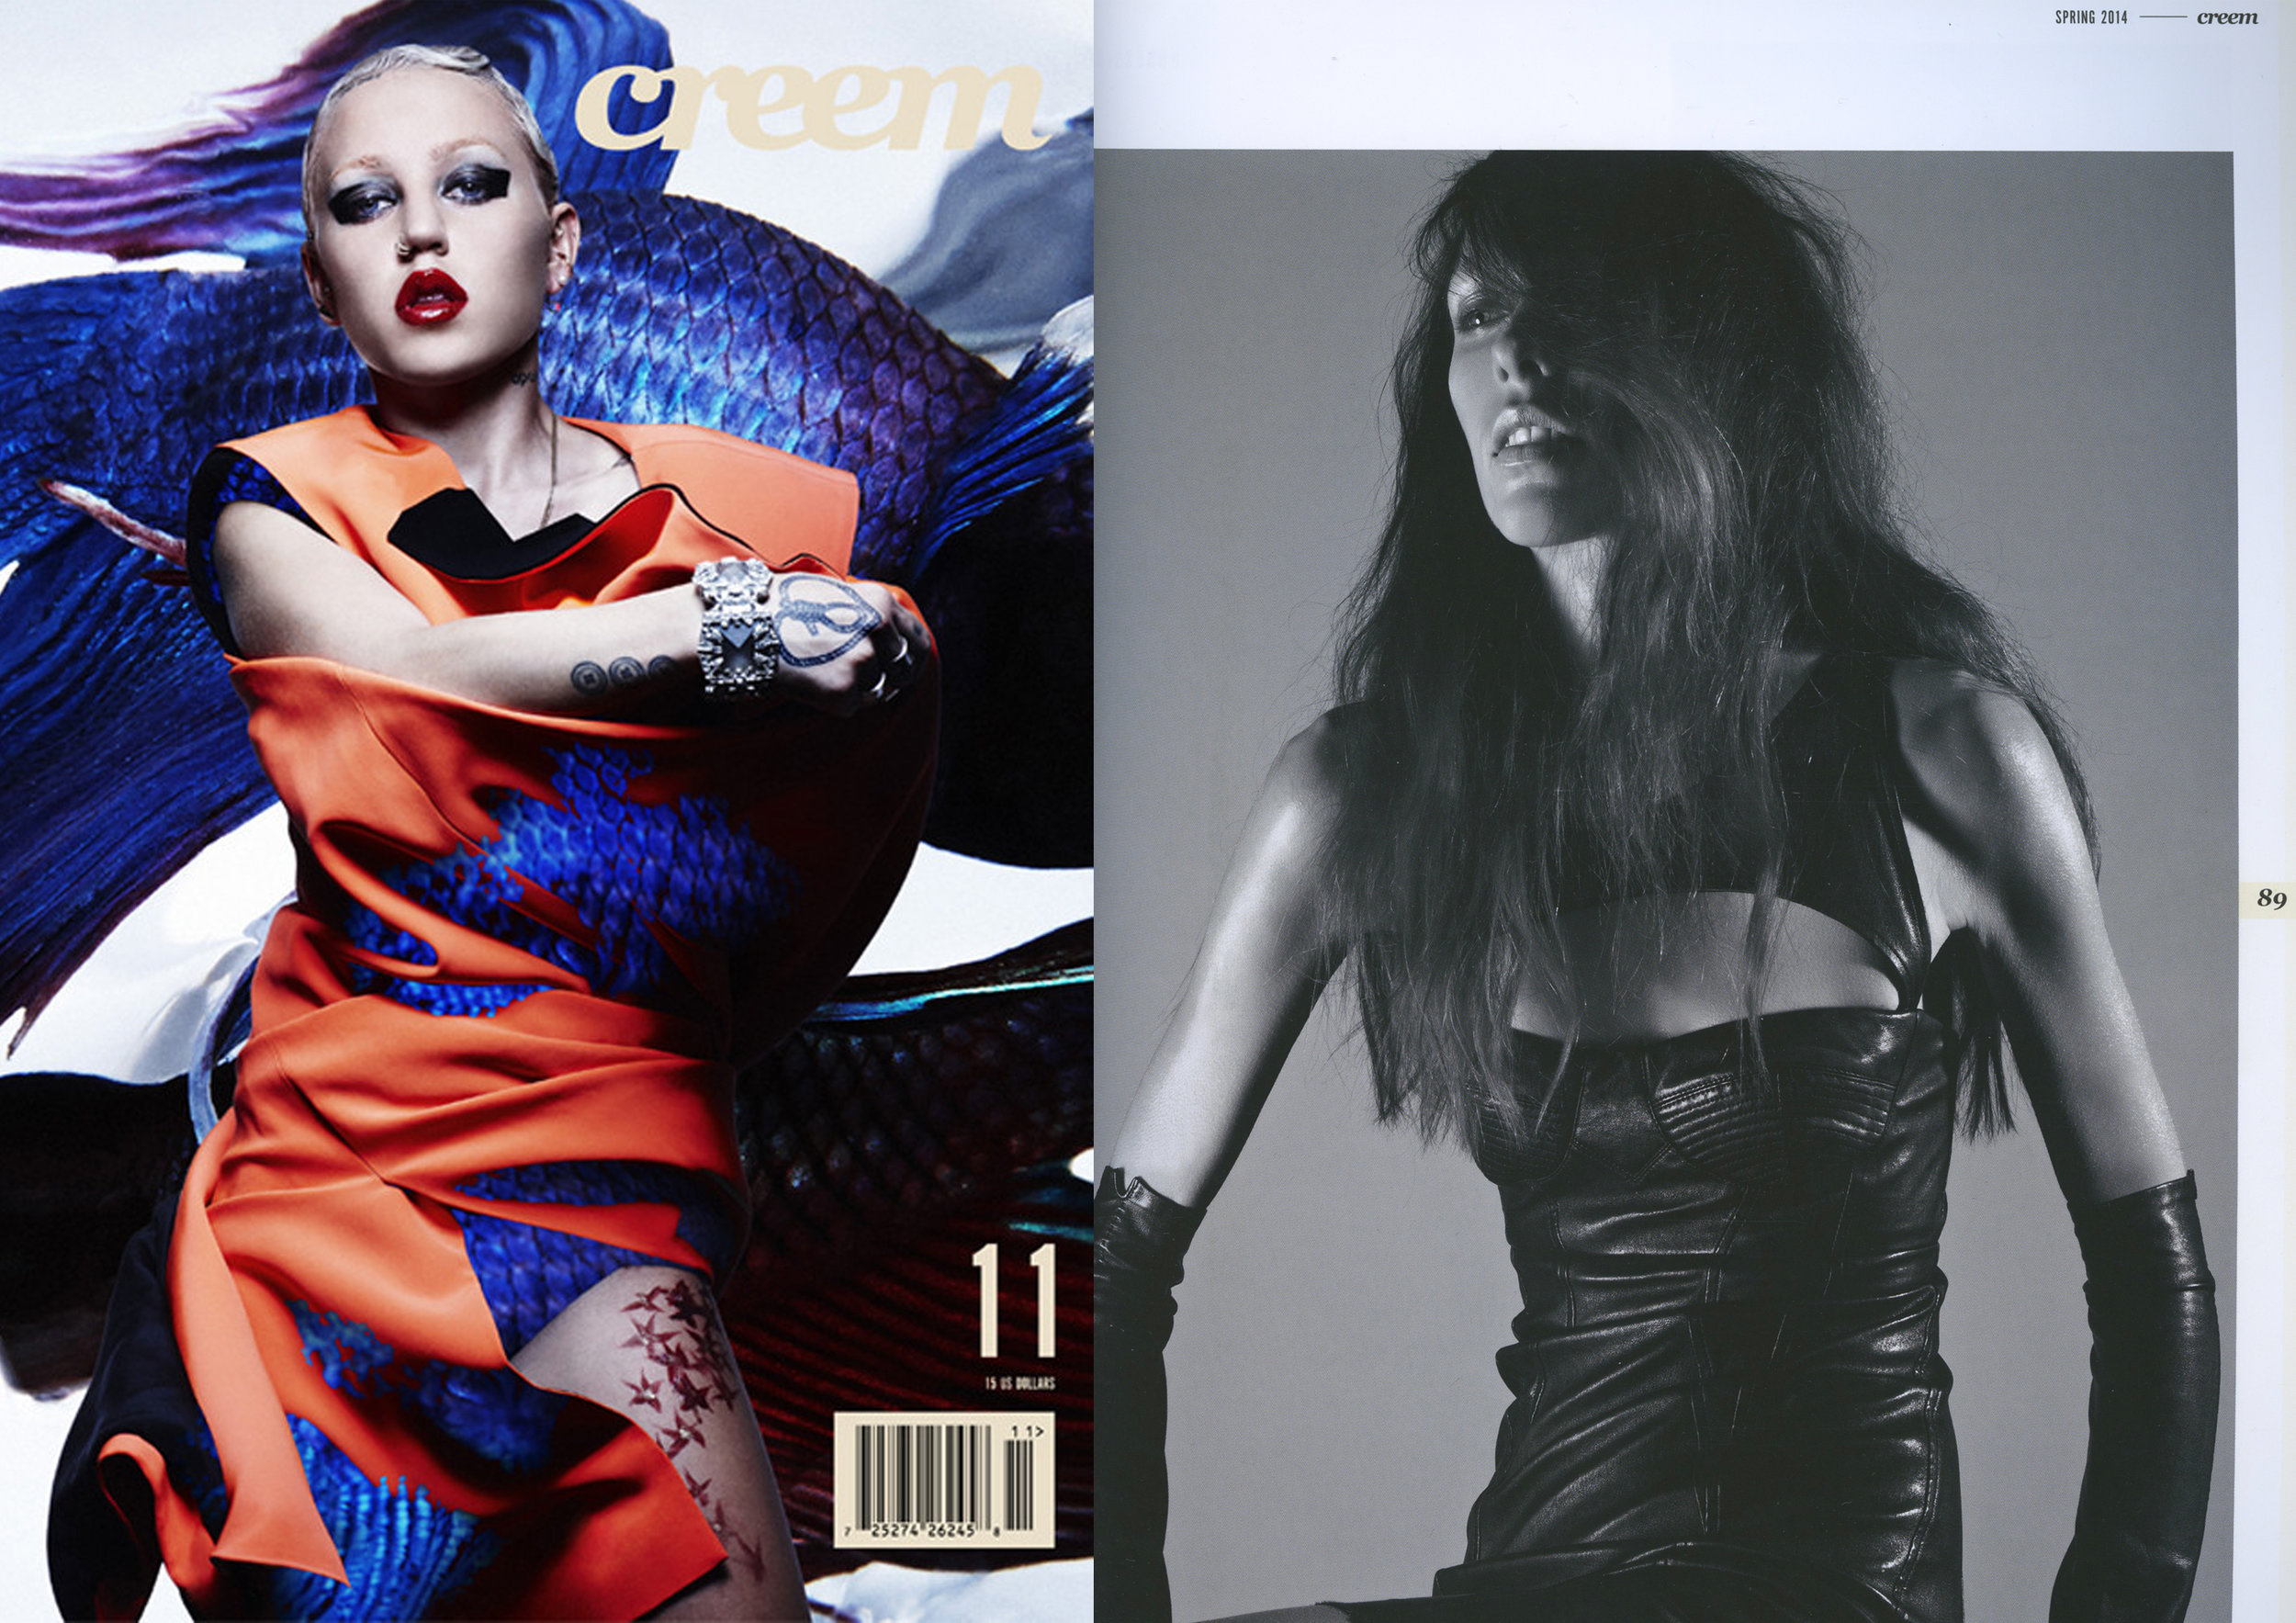 CREEM-POSESSION-ISSUE-11-APRIL-2014 copy.jpg